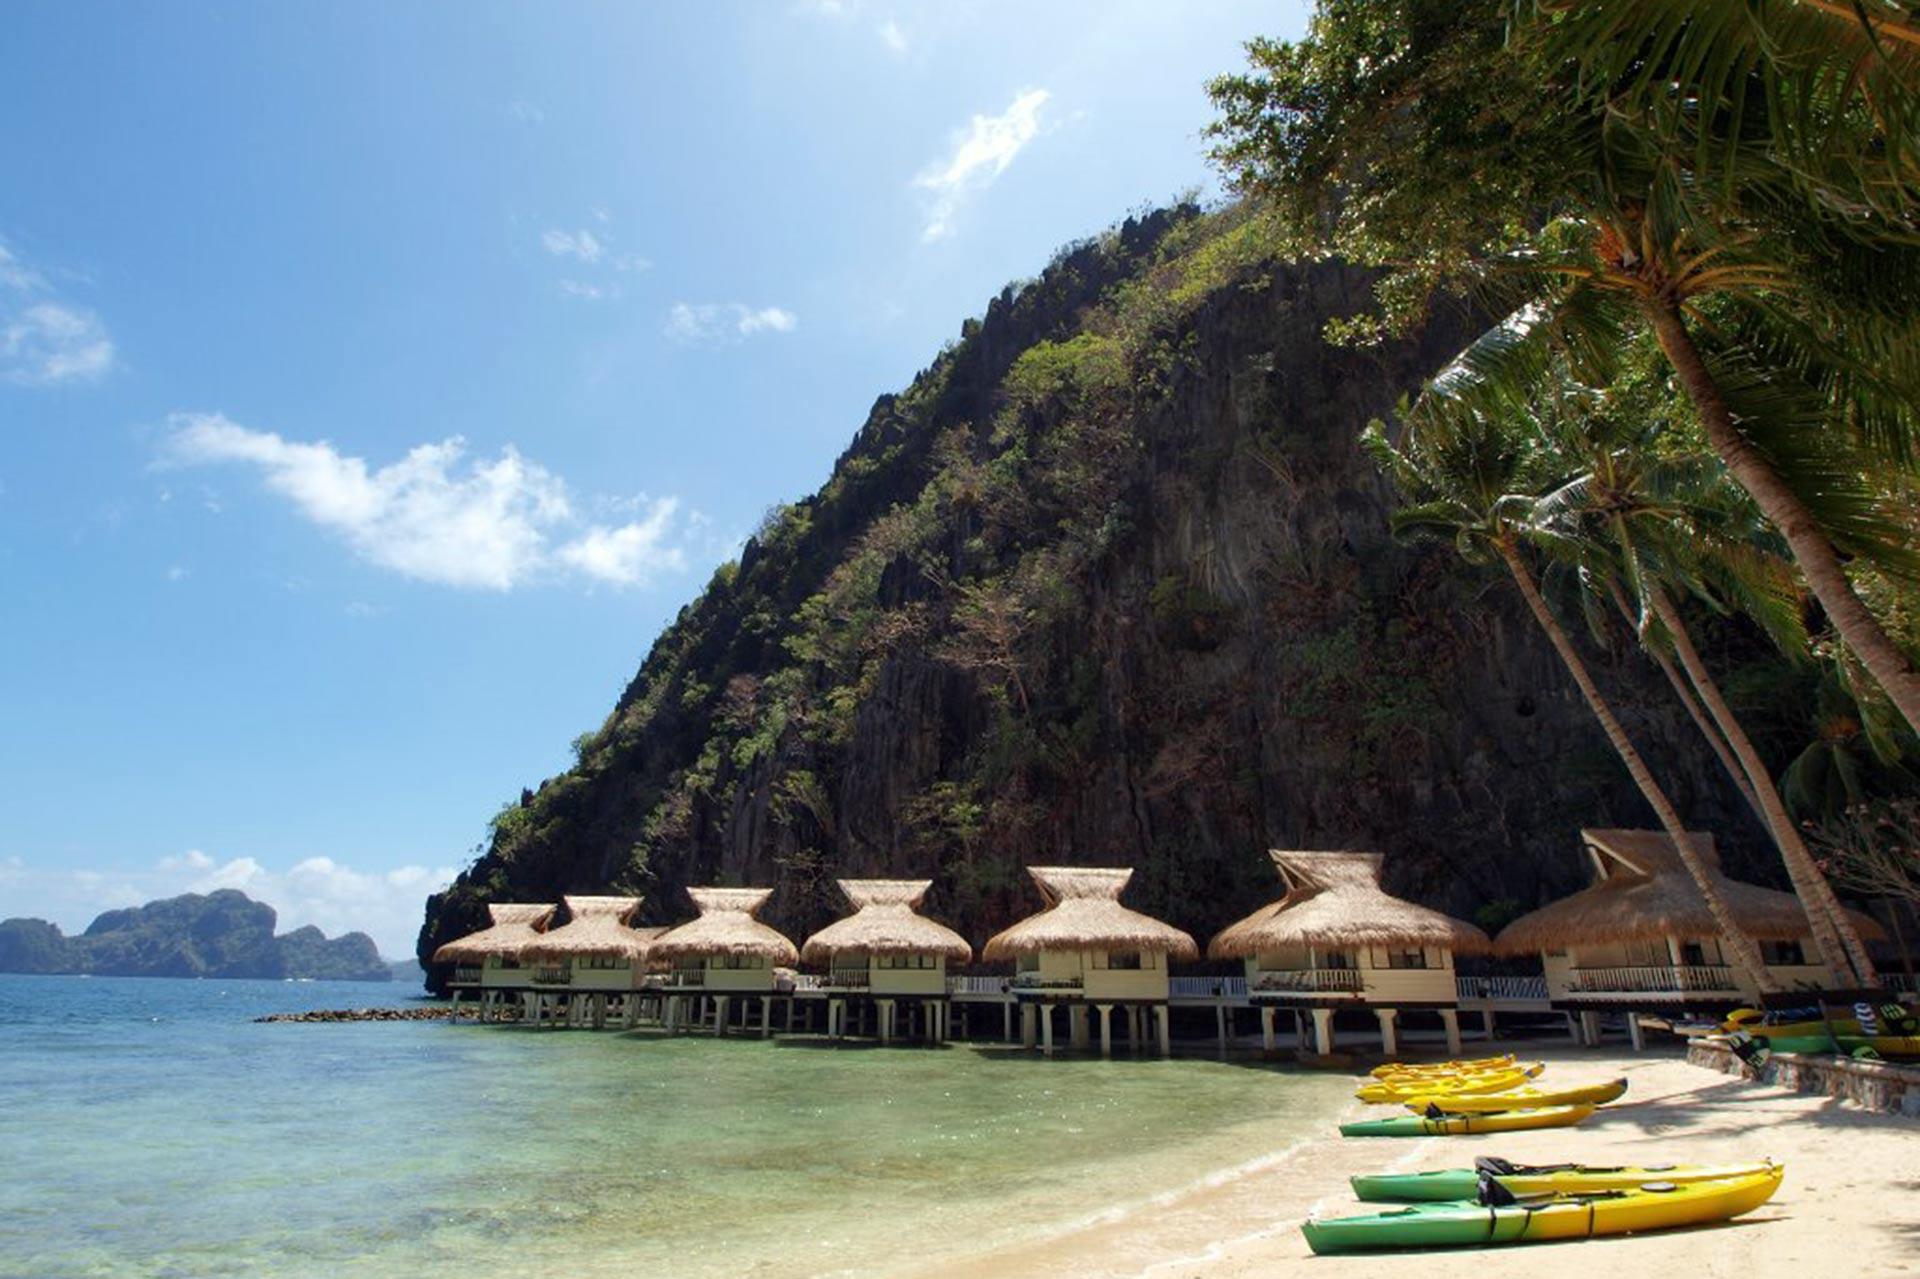 El Nido Miniloc Island in the Philippines; Courtesy of El Nido Miniloc Island